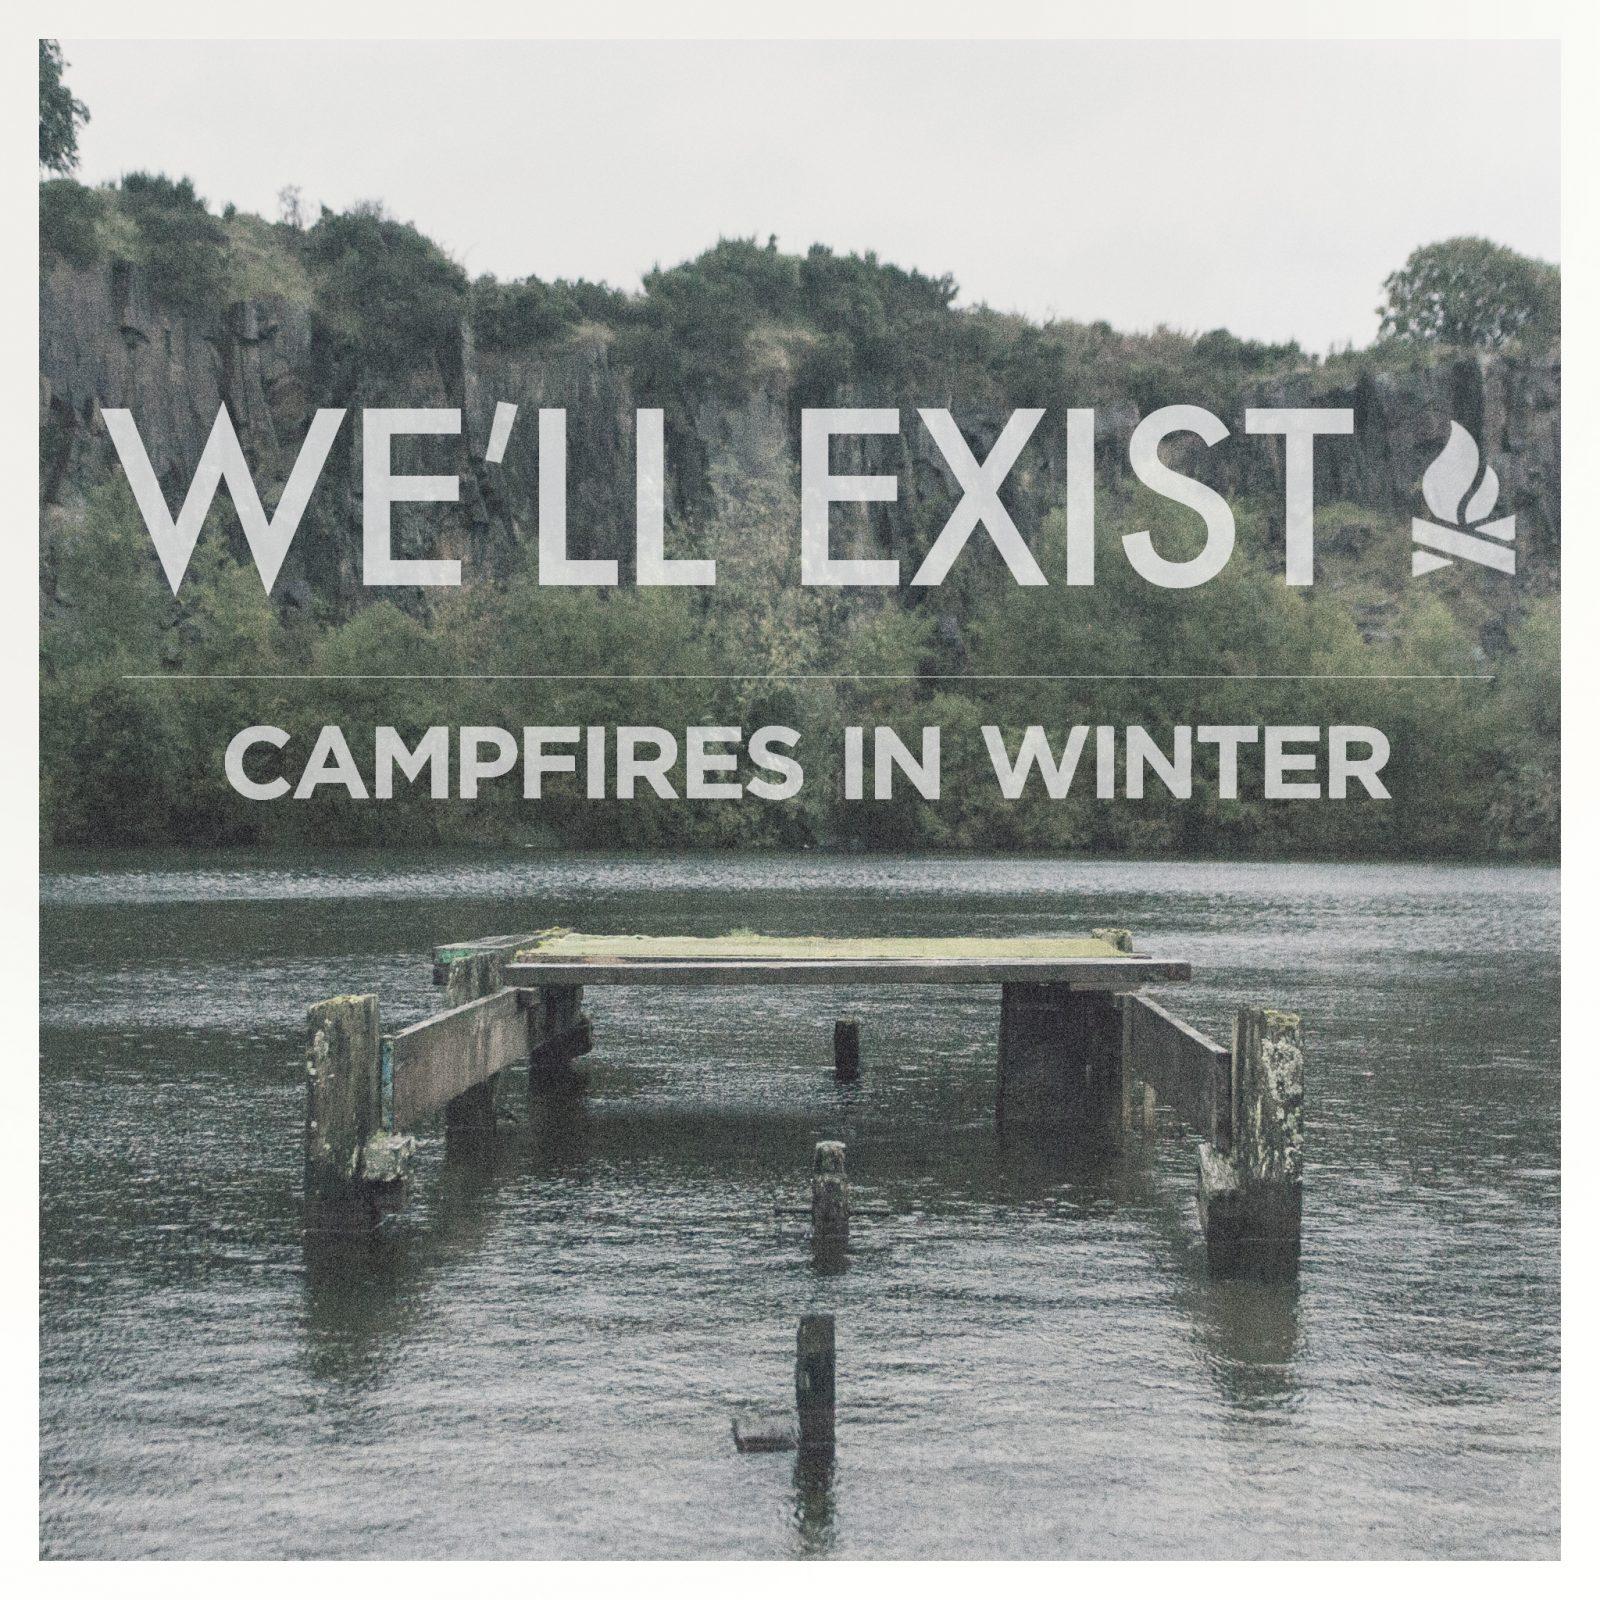 Campfires in Winter - We'll Exist artwork